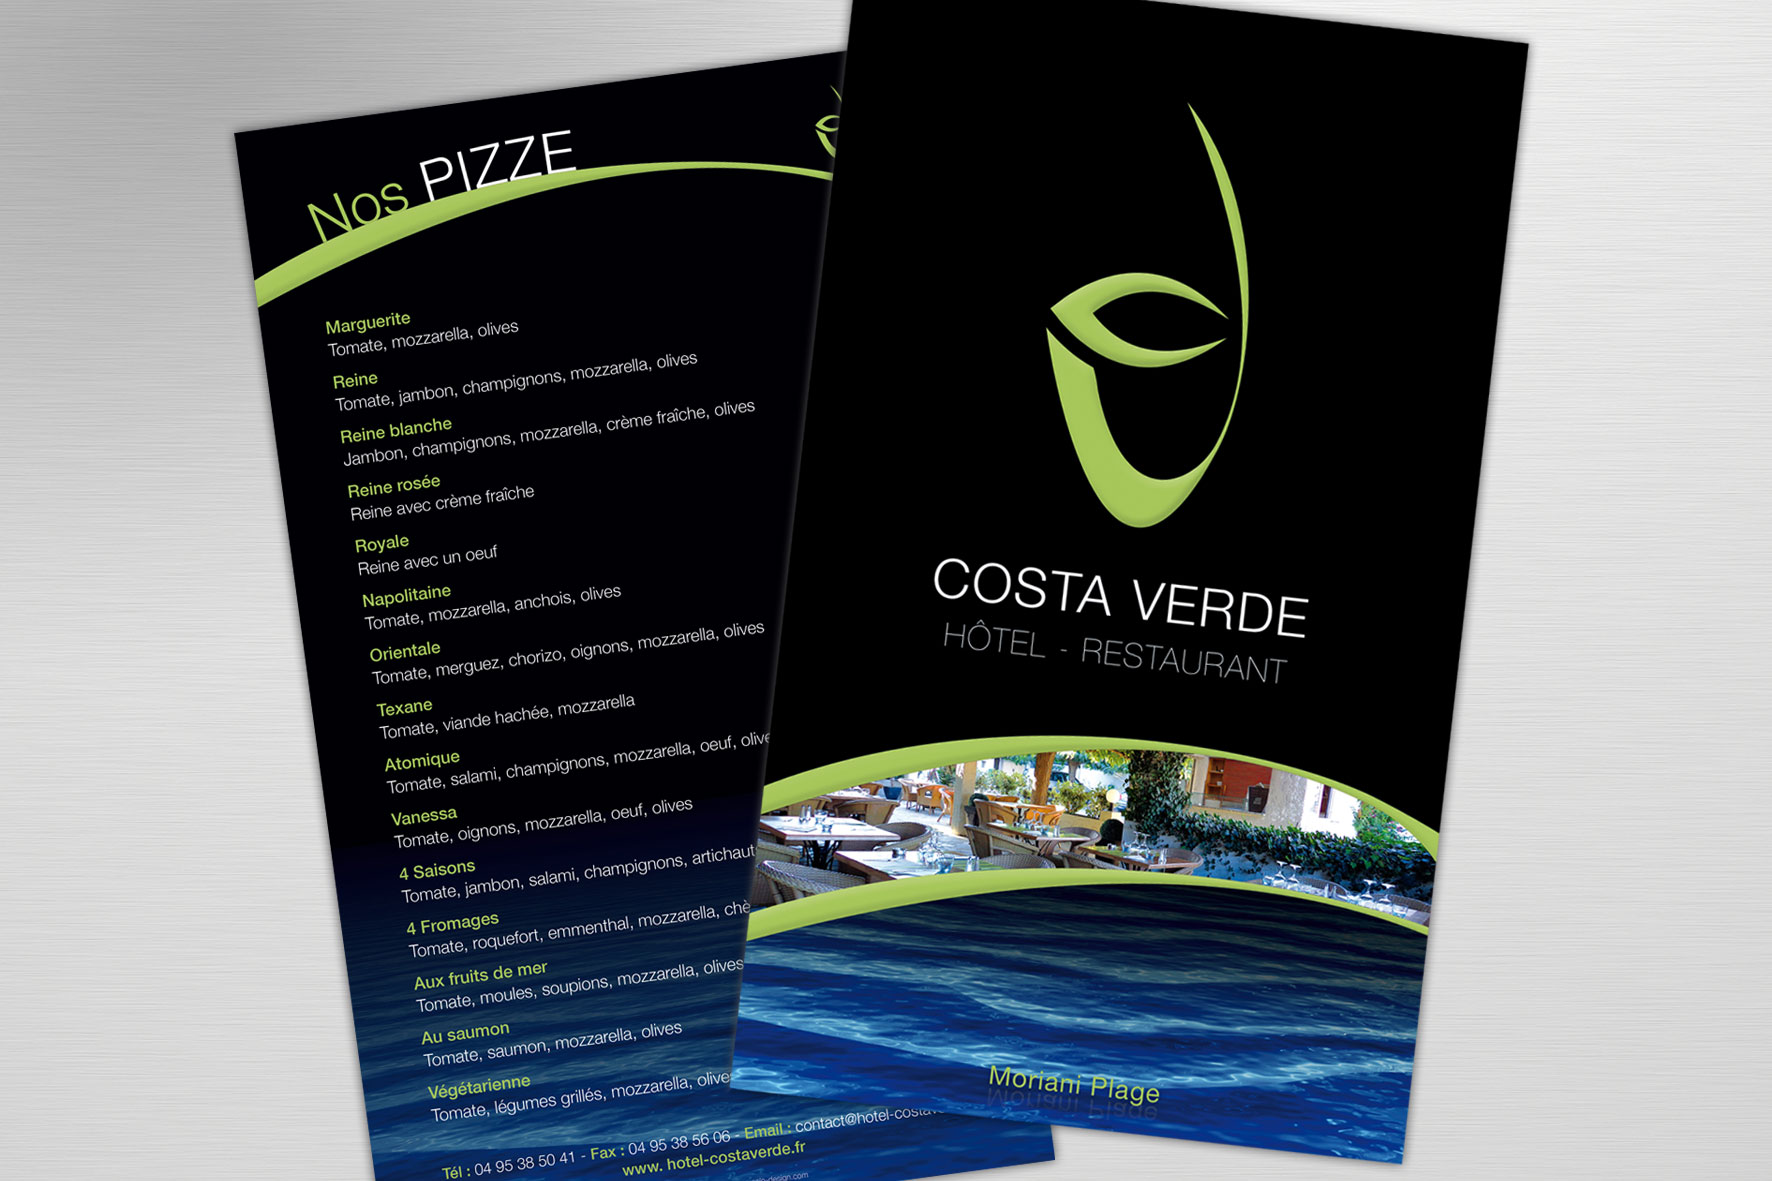 Hôtel Restaurant Costa Verde